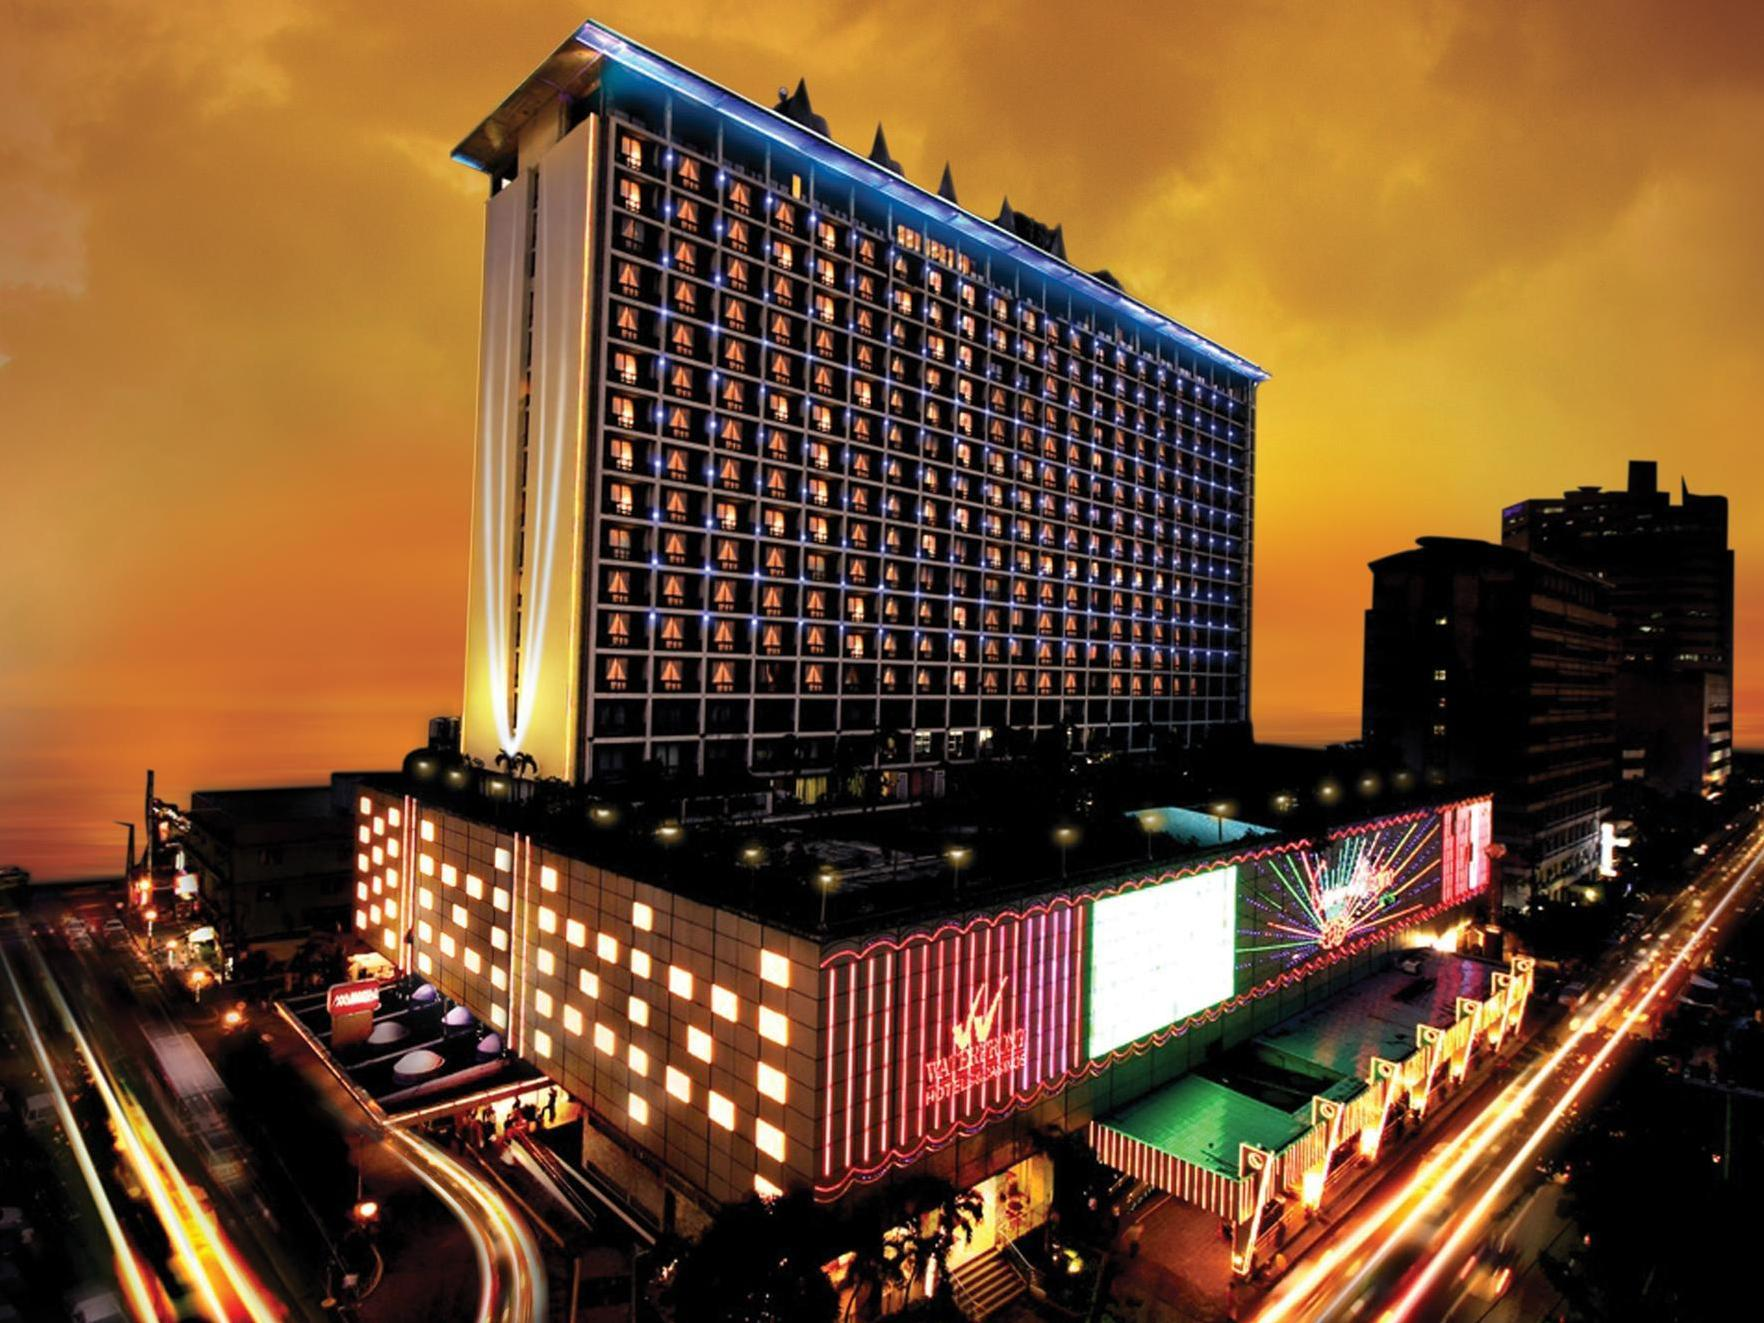 Manila pavilion casino hotel azartplay casino отзывы игроков